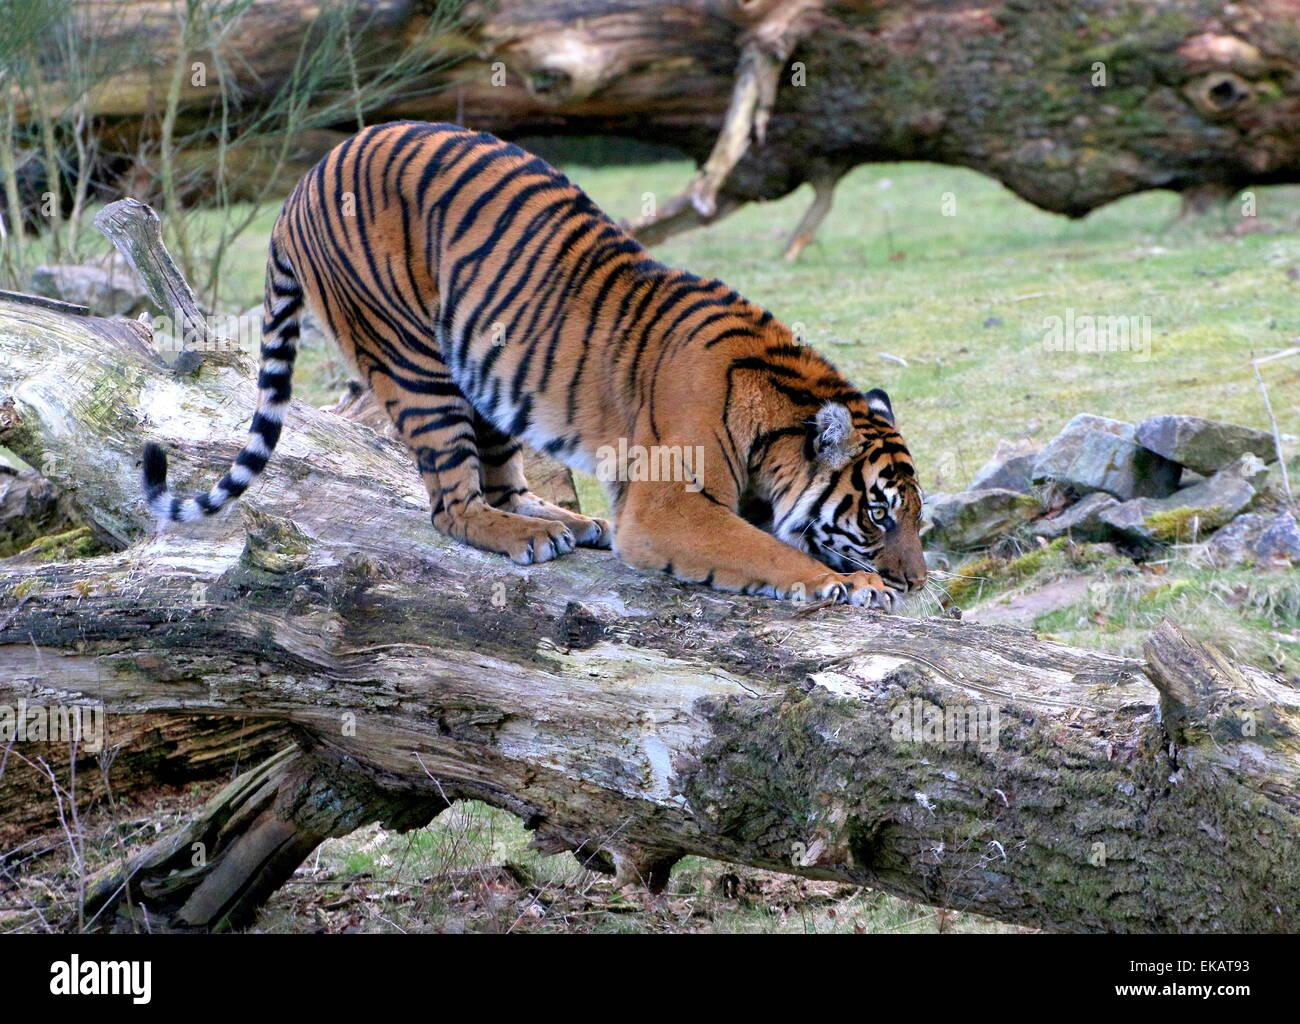 Female Sumatran tiger (Panthera tigris sumatrae) clawing at a tree trunk at Burgers' Bush Arnhem Zoo, The Netherlands - Stock Image